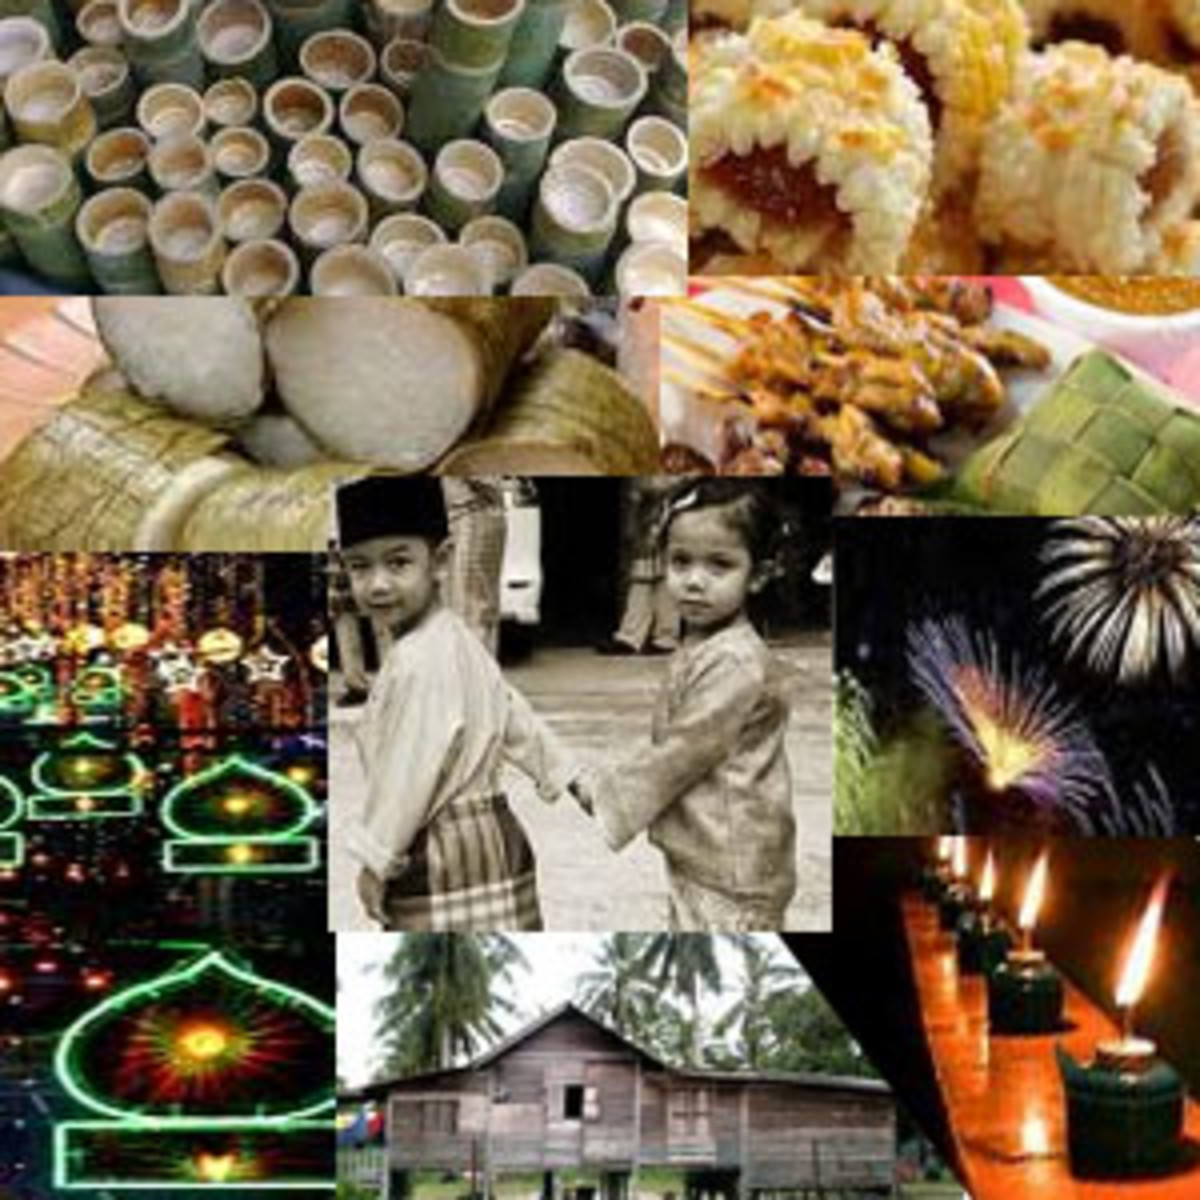 hari raya celebrated in malaysia Masjid zahir, alor setar kedah, malaysia hari raya haji (adiladha) this  celebration of sacrifice comes two months and ten days after hari raya puasa  on this.